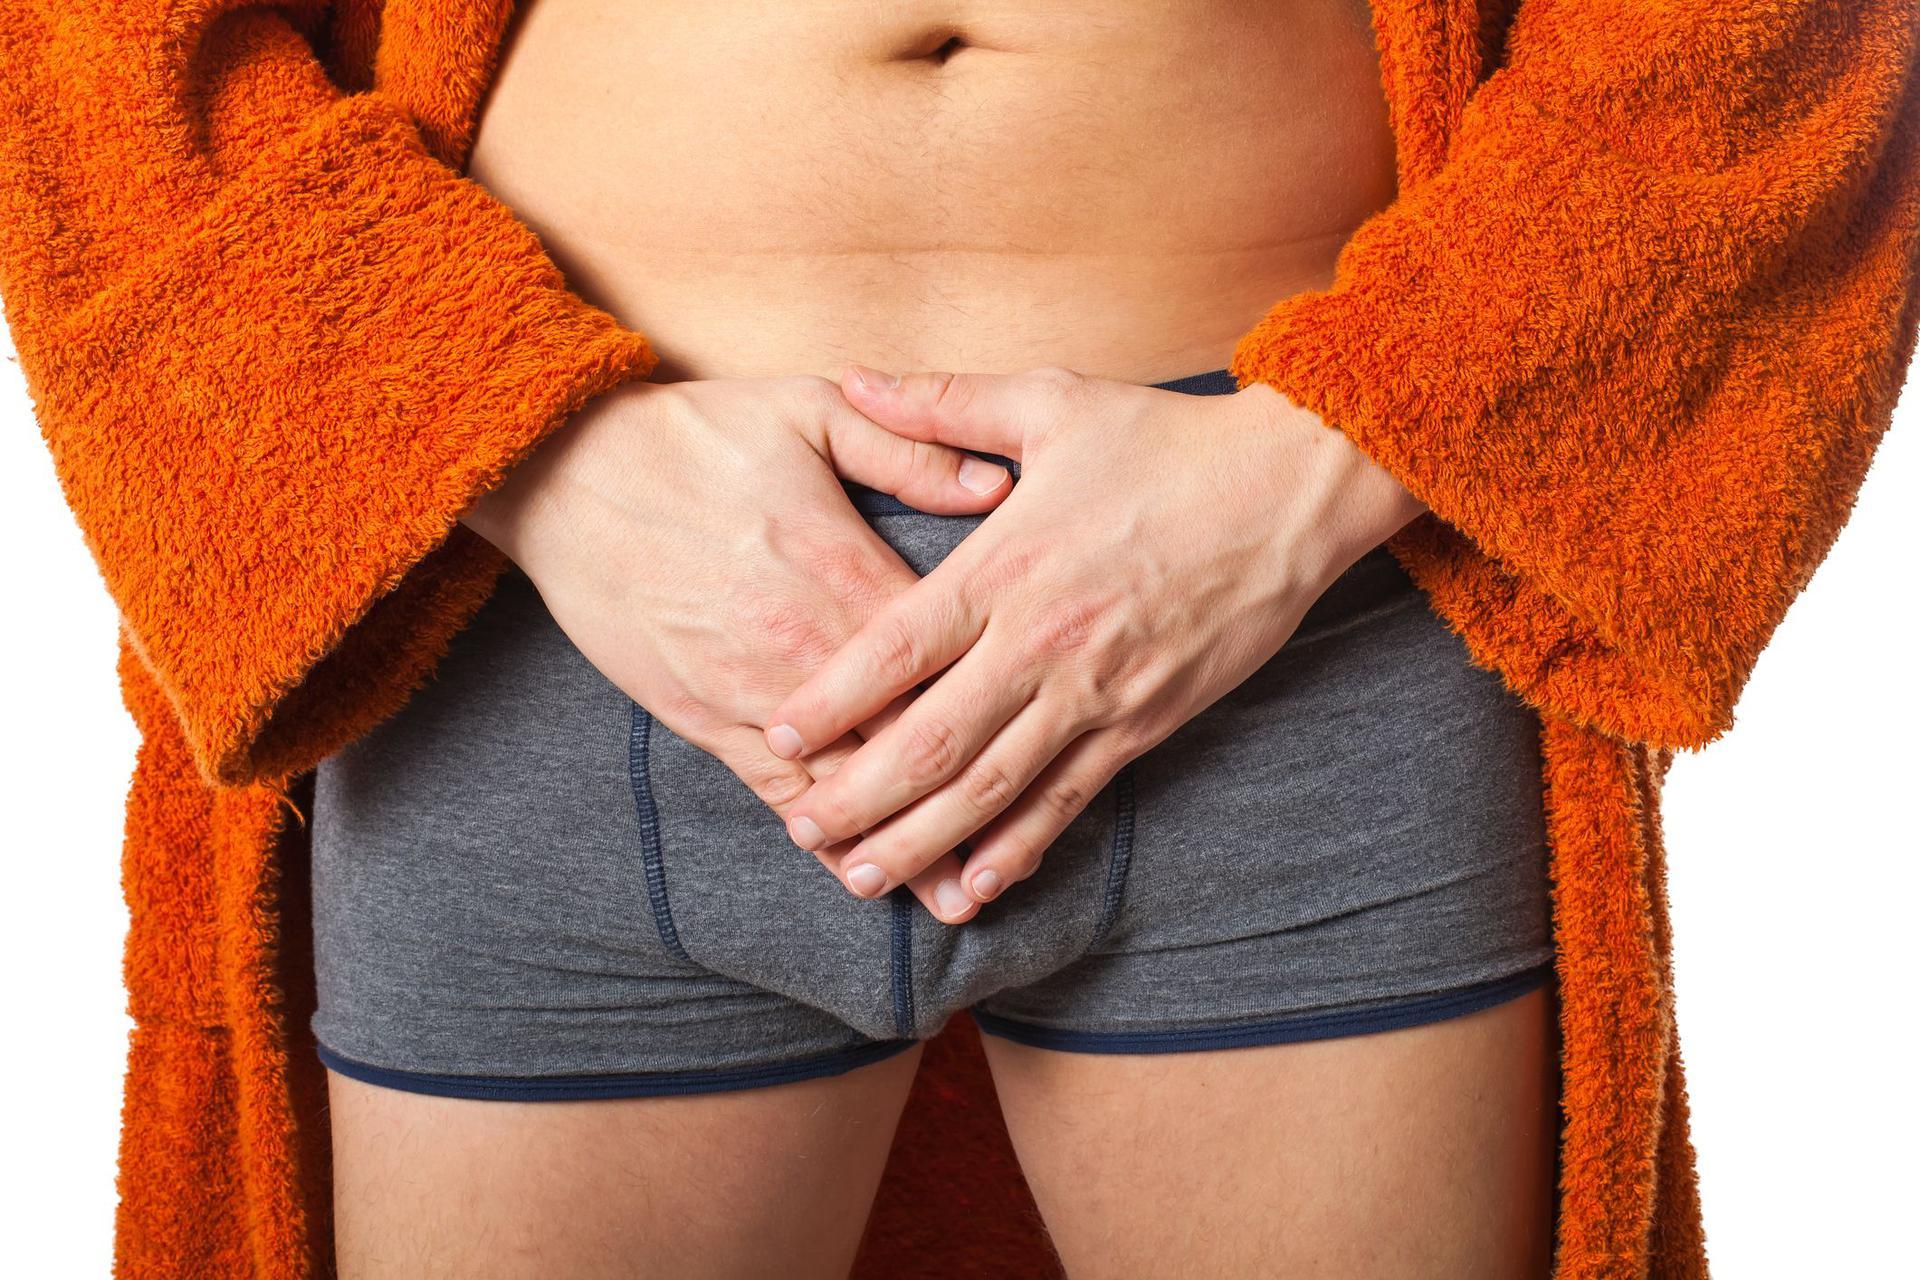 Erectile dysfunction and cardiovascular disease | Zdrojewicz | Seksuologia Polska (Polish Sexology)